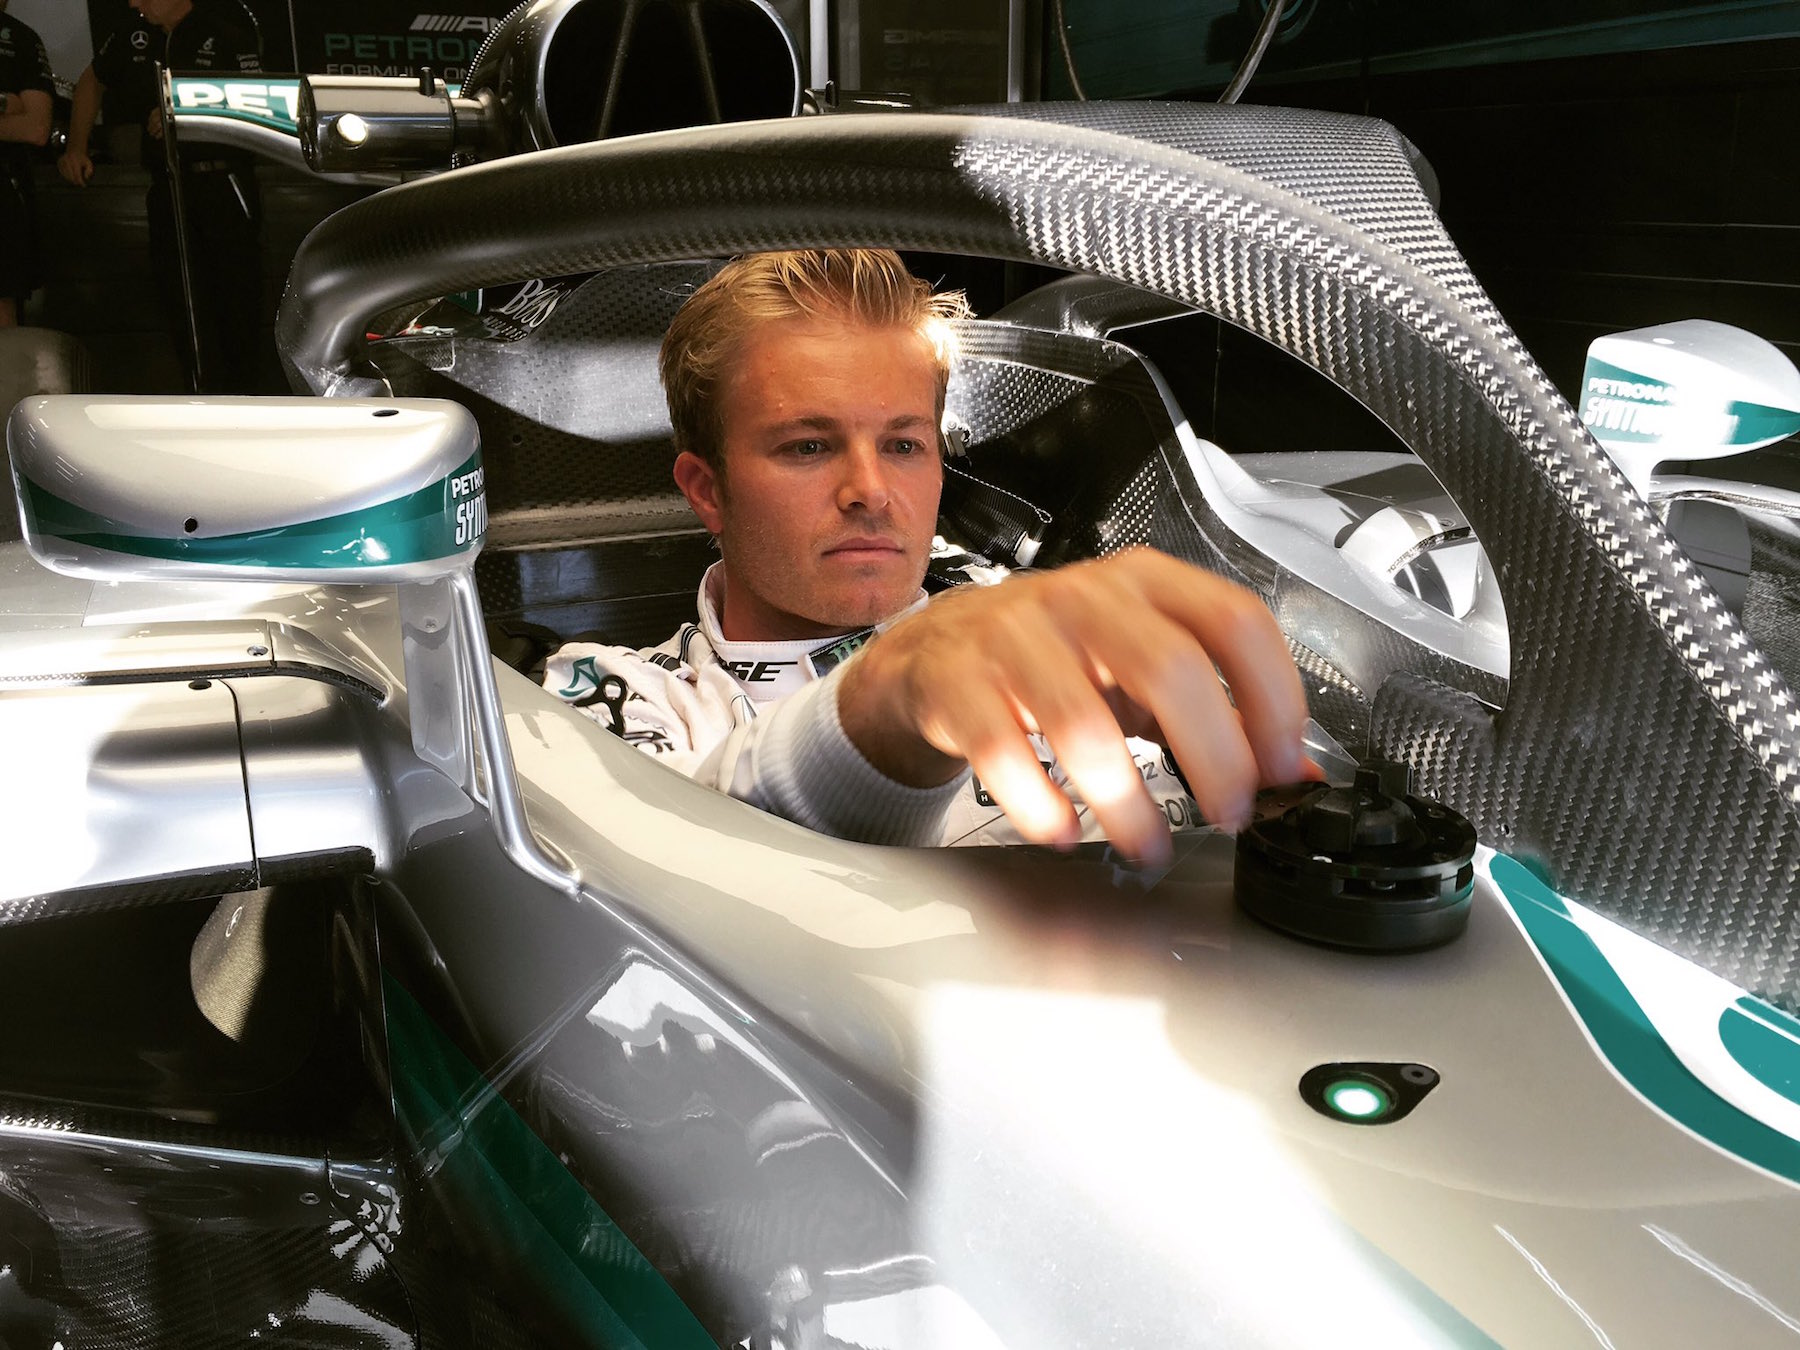 Salracing - Nico Rosberg's Mercedes with halo